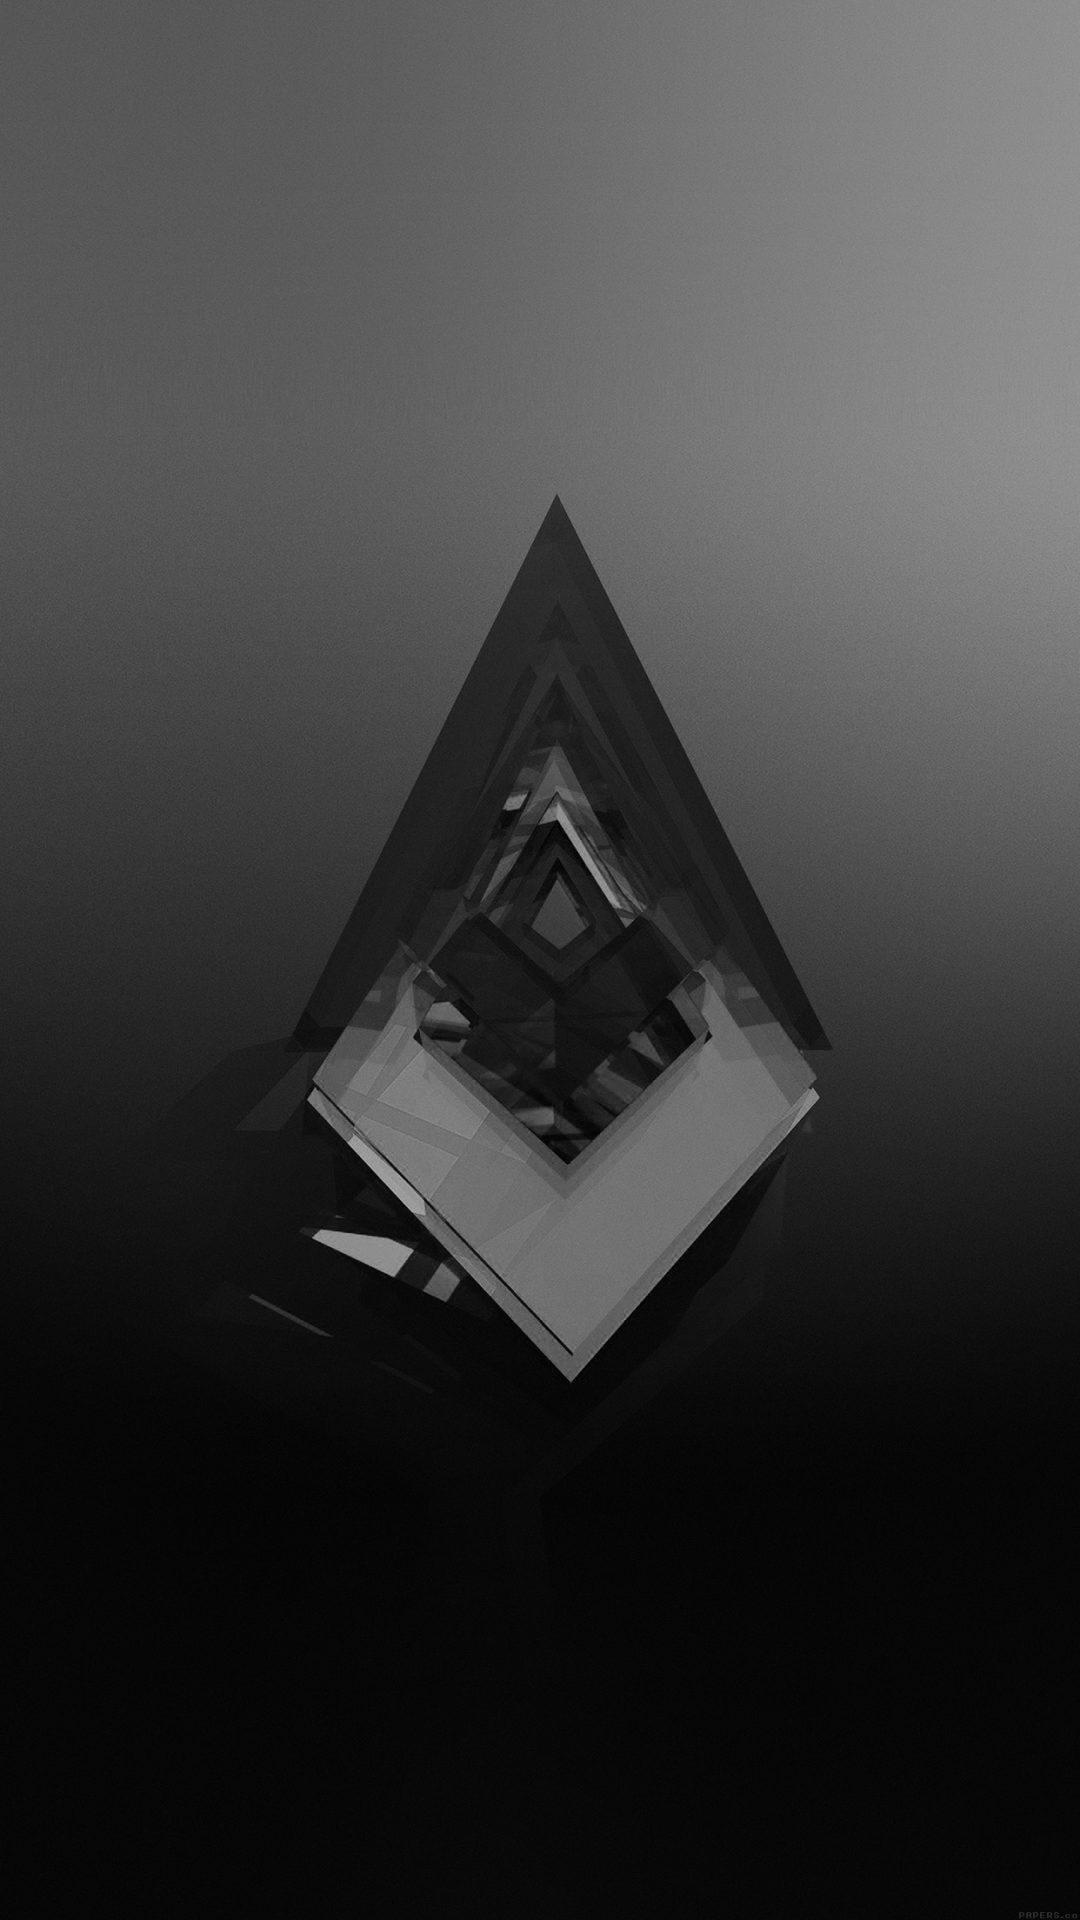 Symbol Abstract Dark Black